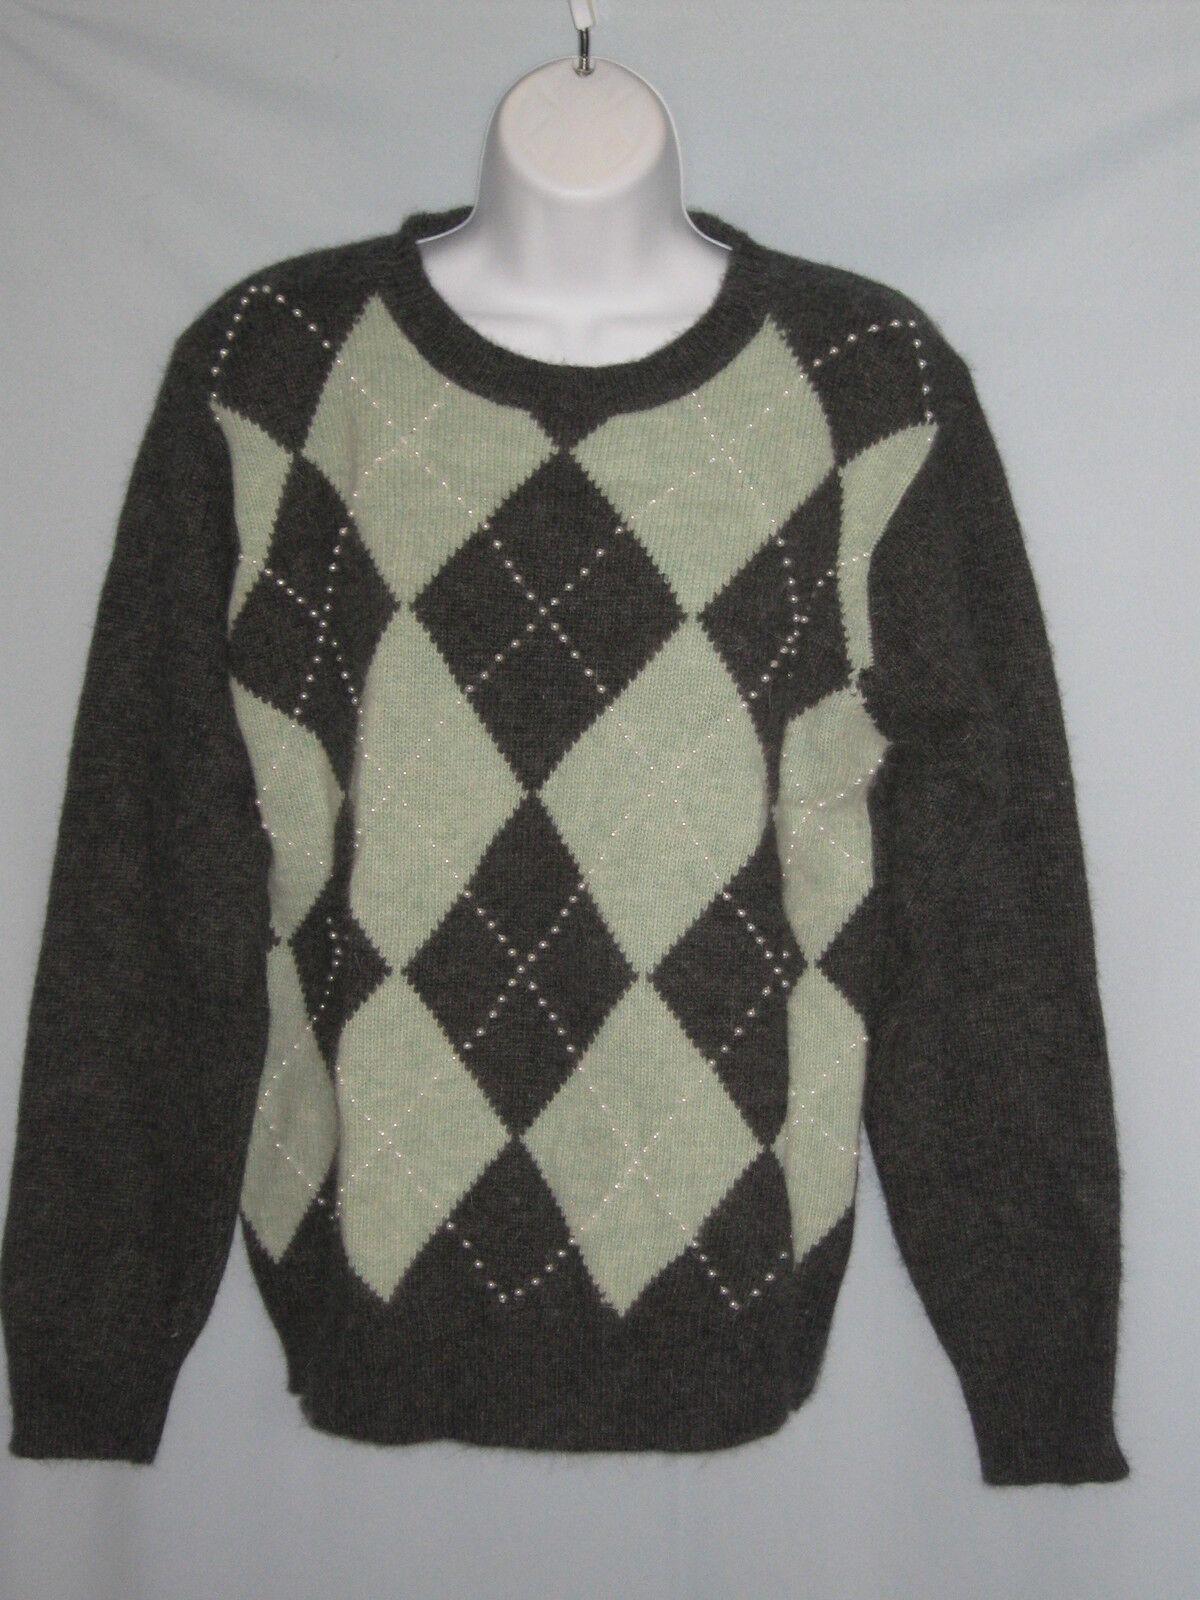 Saks Fifth Avenue Argyle Sweater Lambs Wolle Angora Beads NWT Sz Medium  CL136